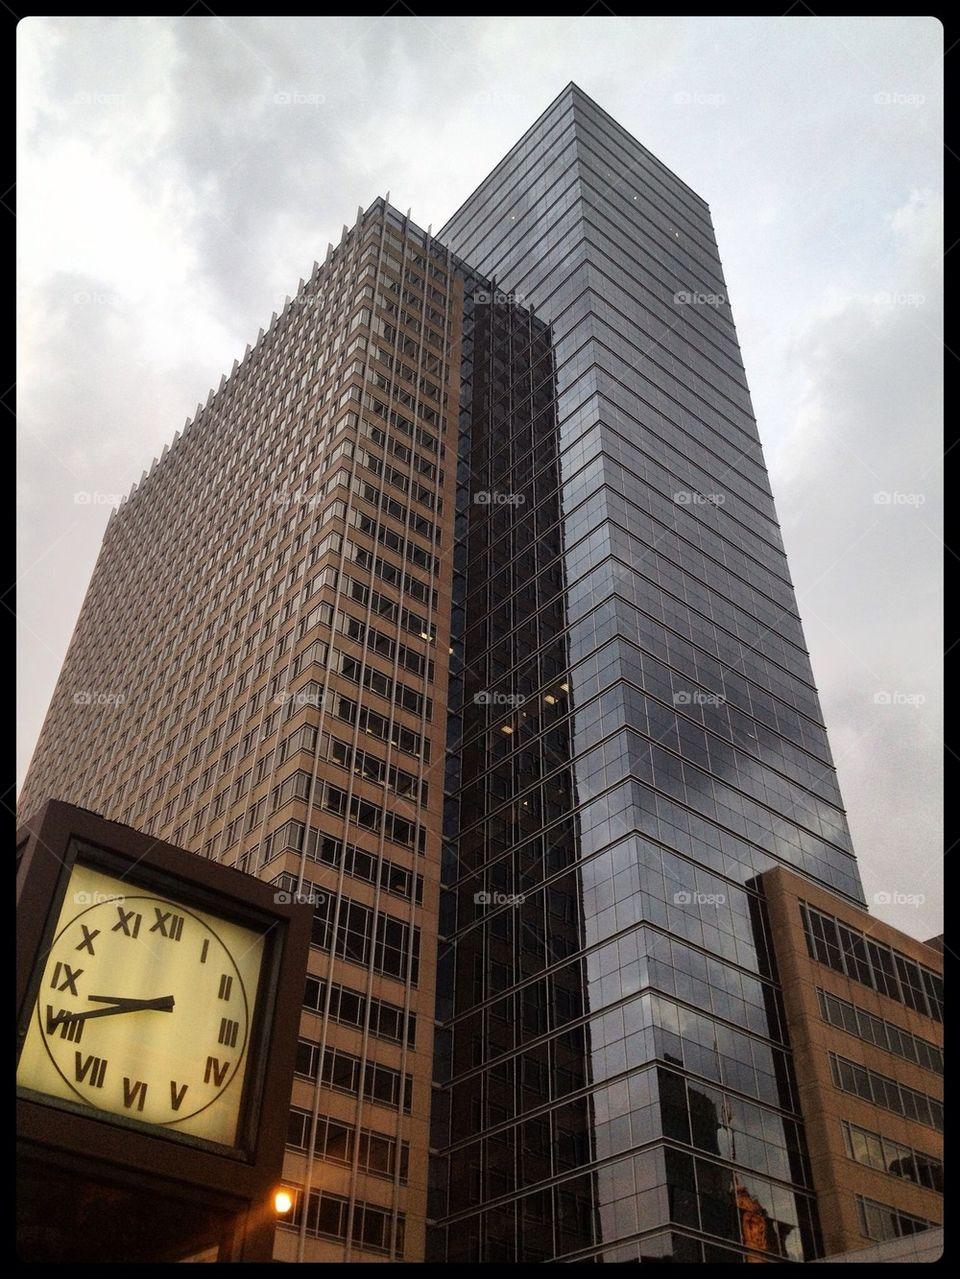 Target Corparate Headquarters, Minneapolis